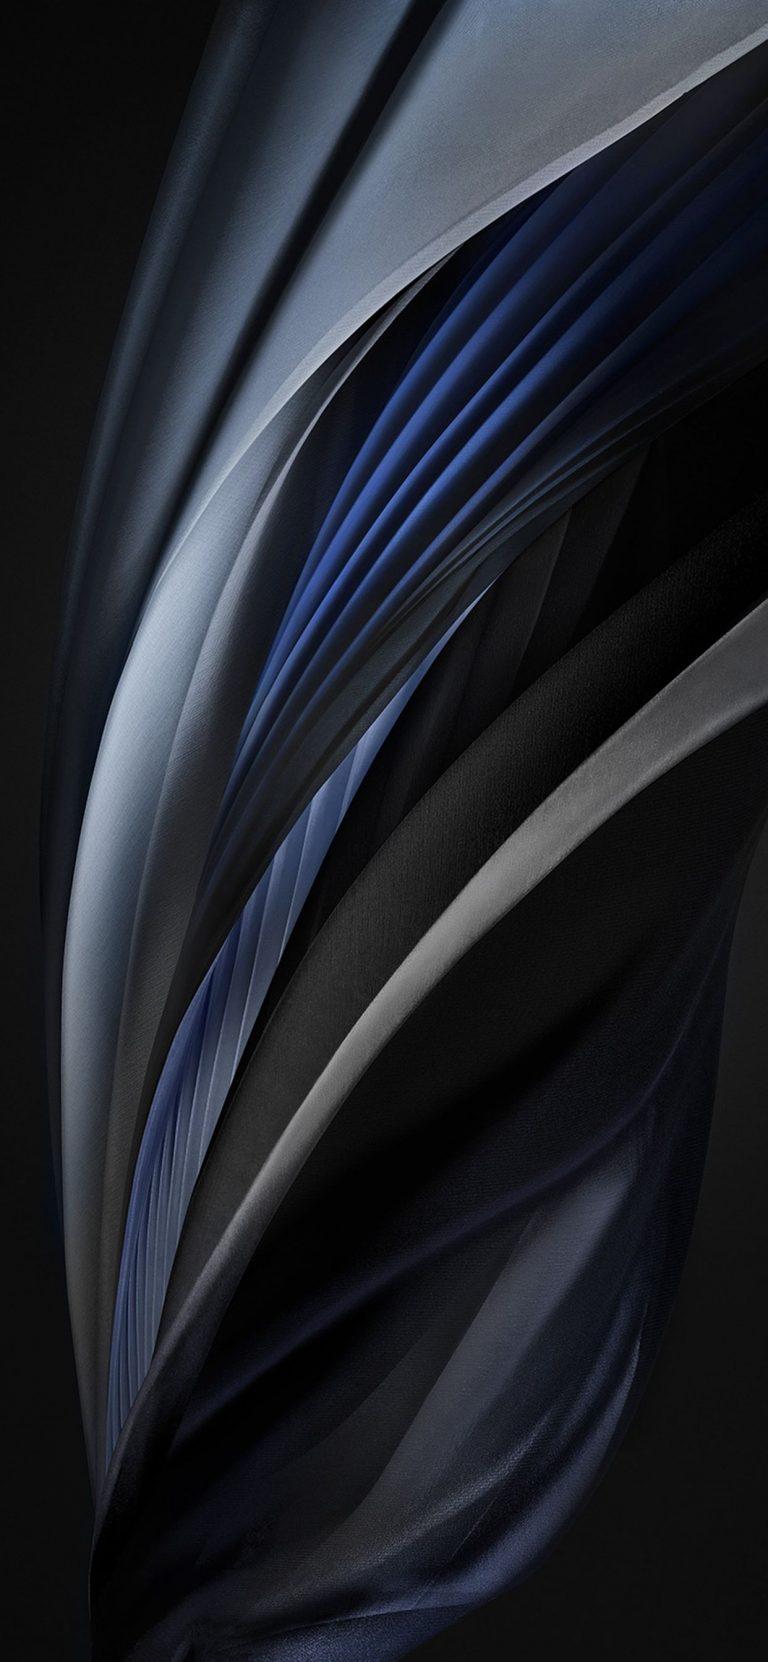 Apple iPhone SE 2020 Stock Wallpaper [1242x2688] - 06